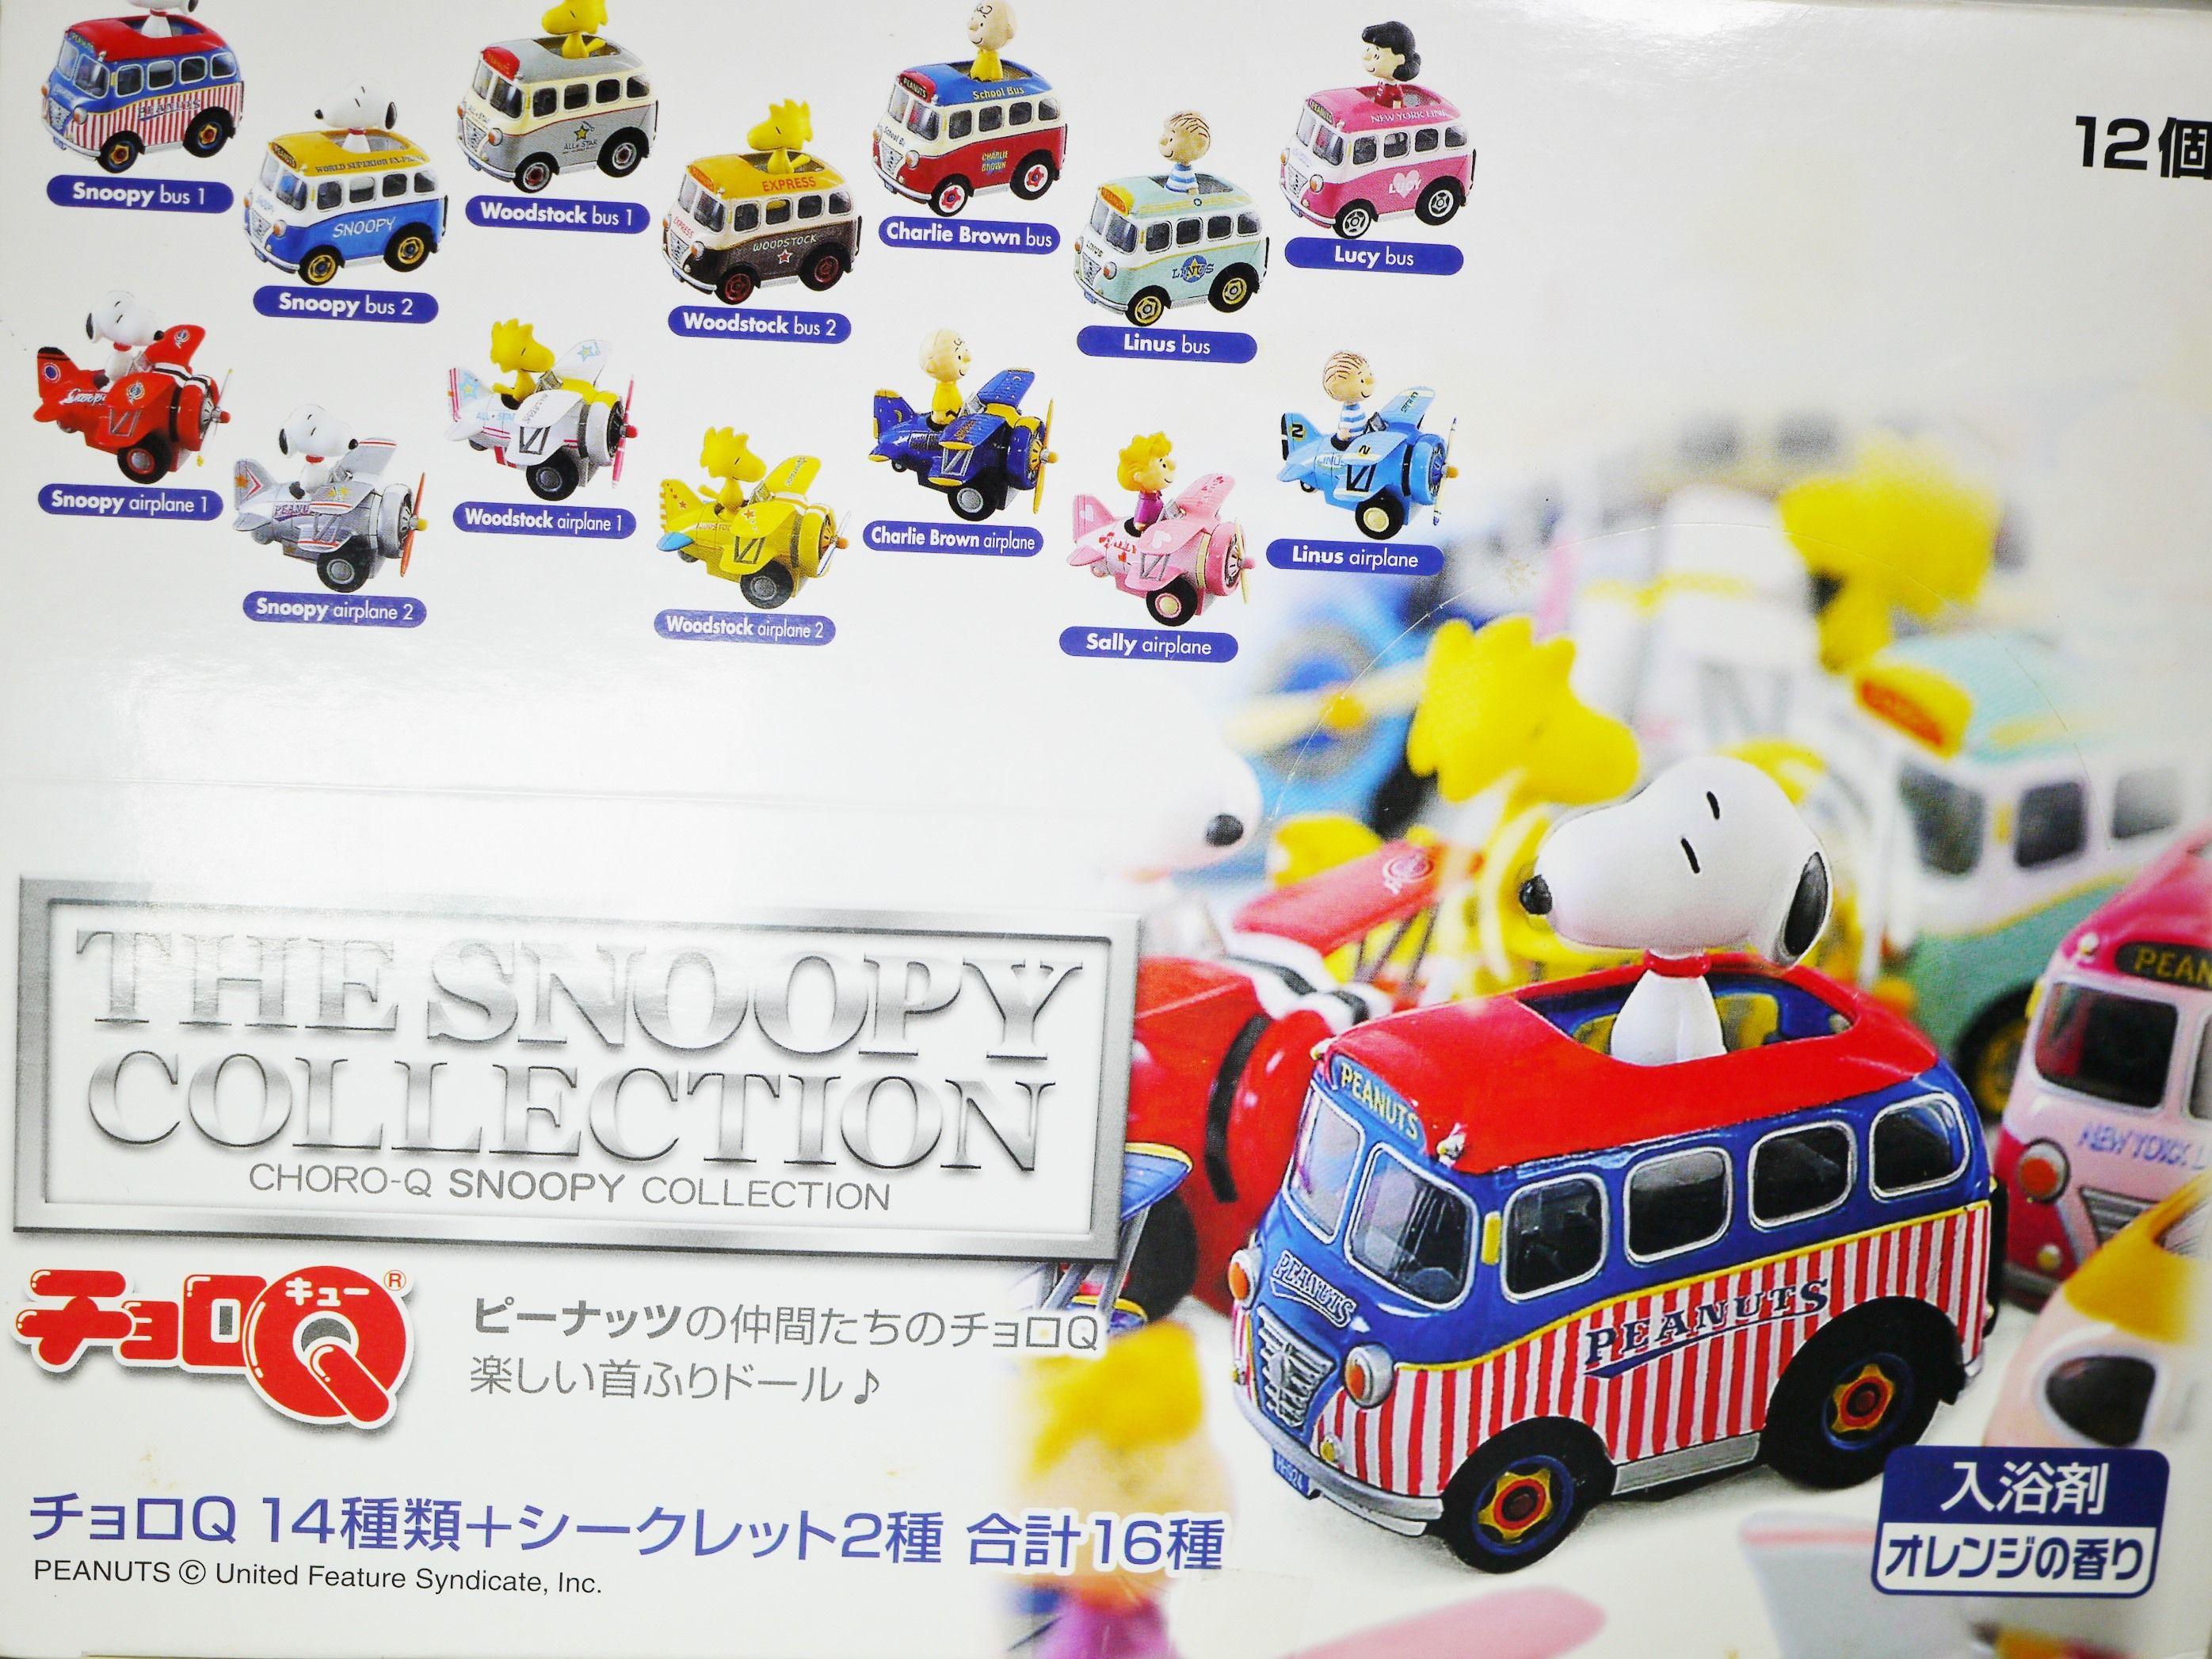 Takara Choro Q Peanuts Comic Snoopy Collection Vehicle Series Full Box 12pc Peanuts Snoopy Comics Snoopy Peanut